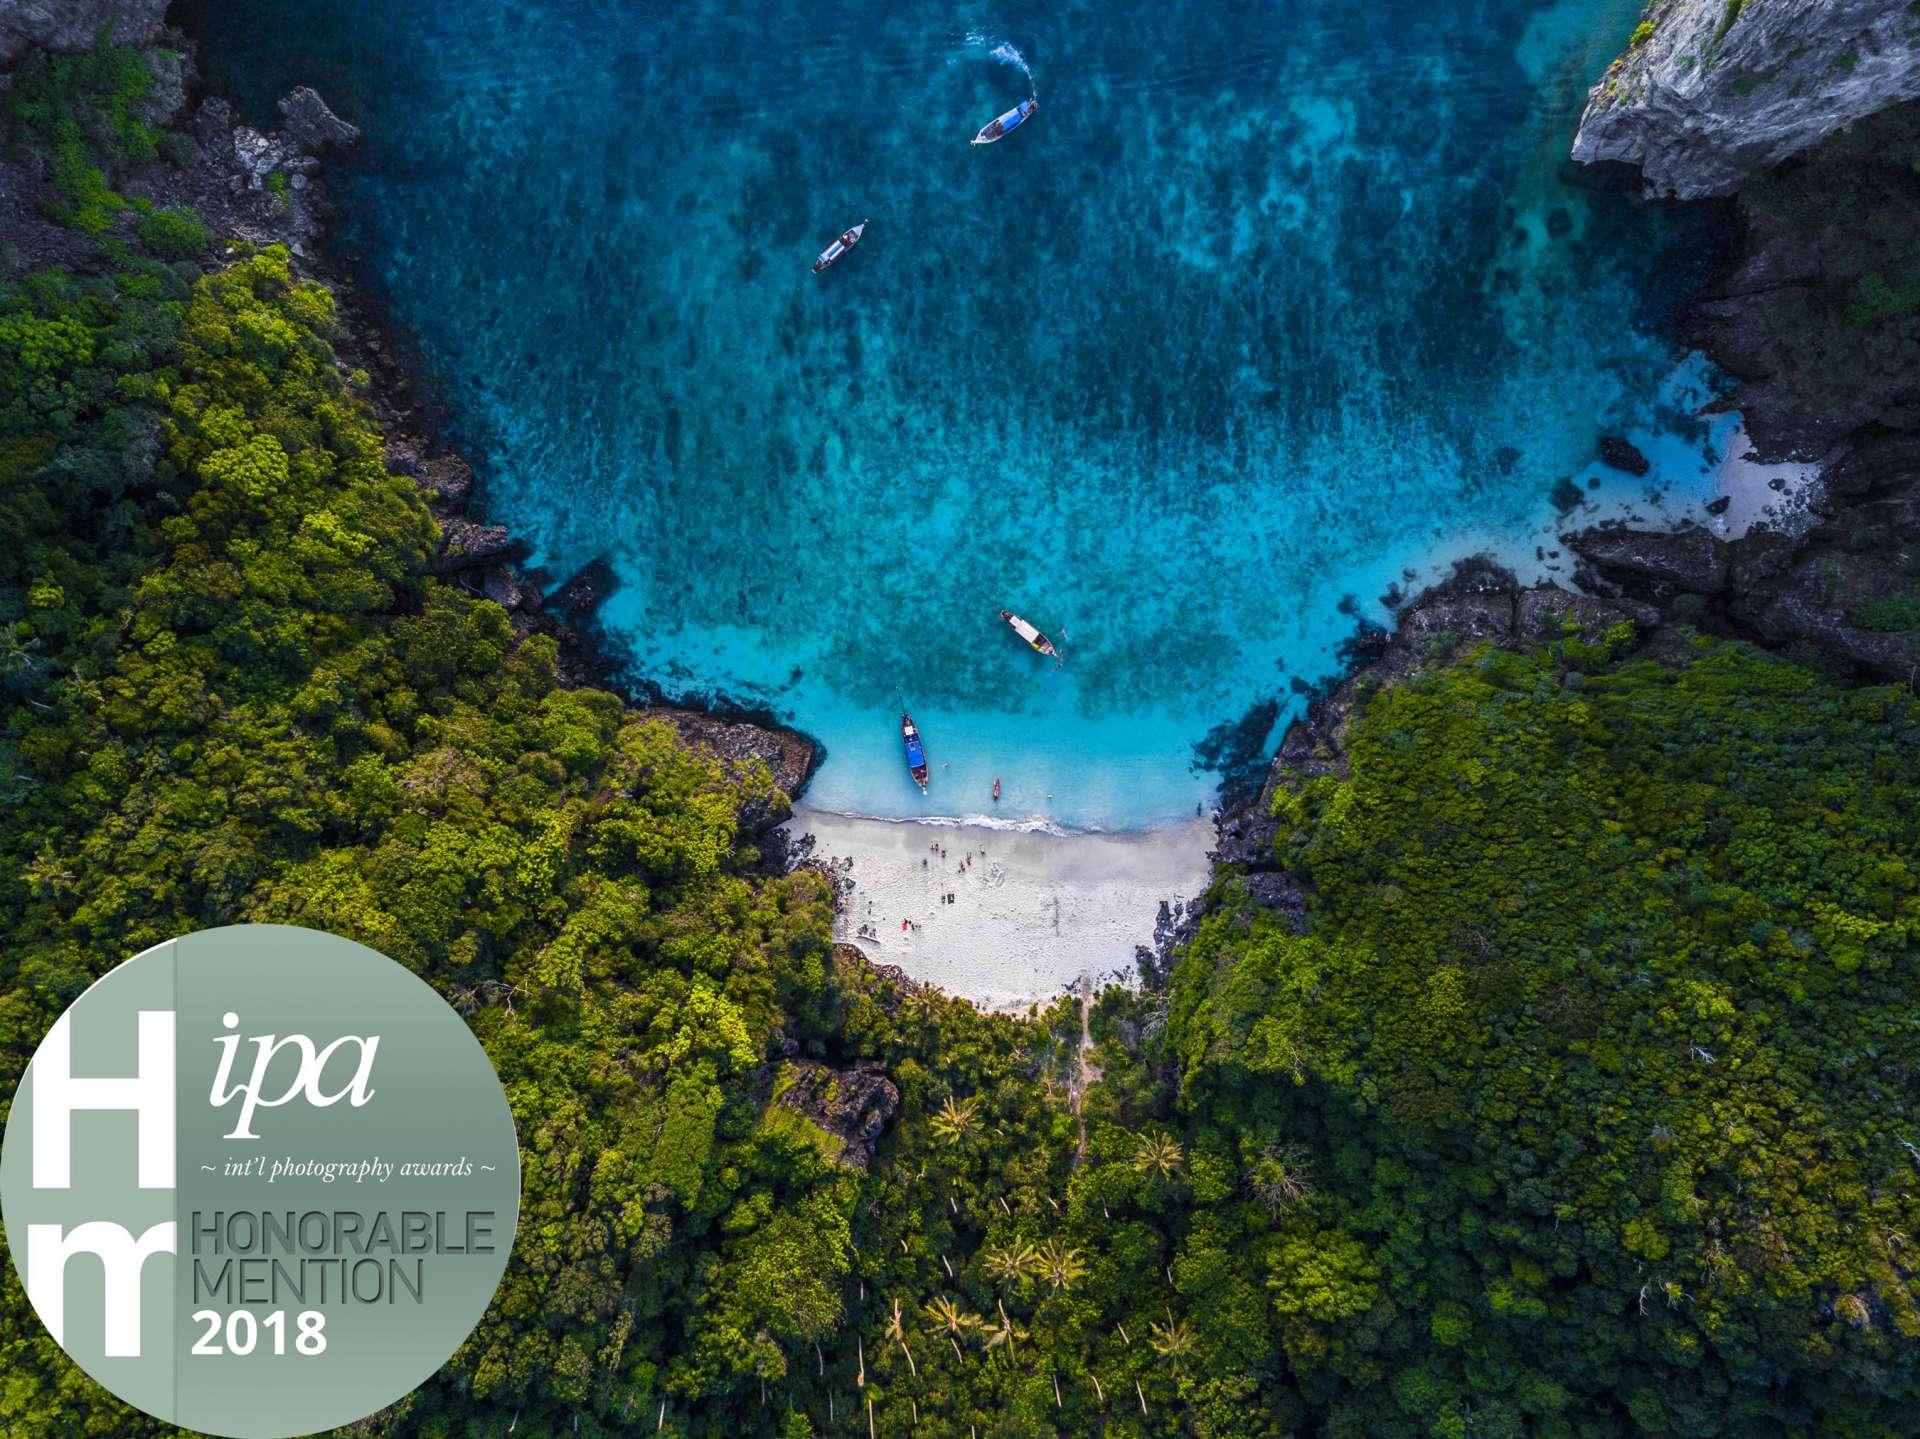 IPA 2018 International Photography Awards 2018 Enrico Pescantini Honorable Mention Jungle Beach